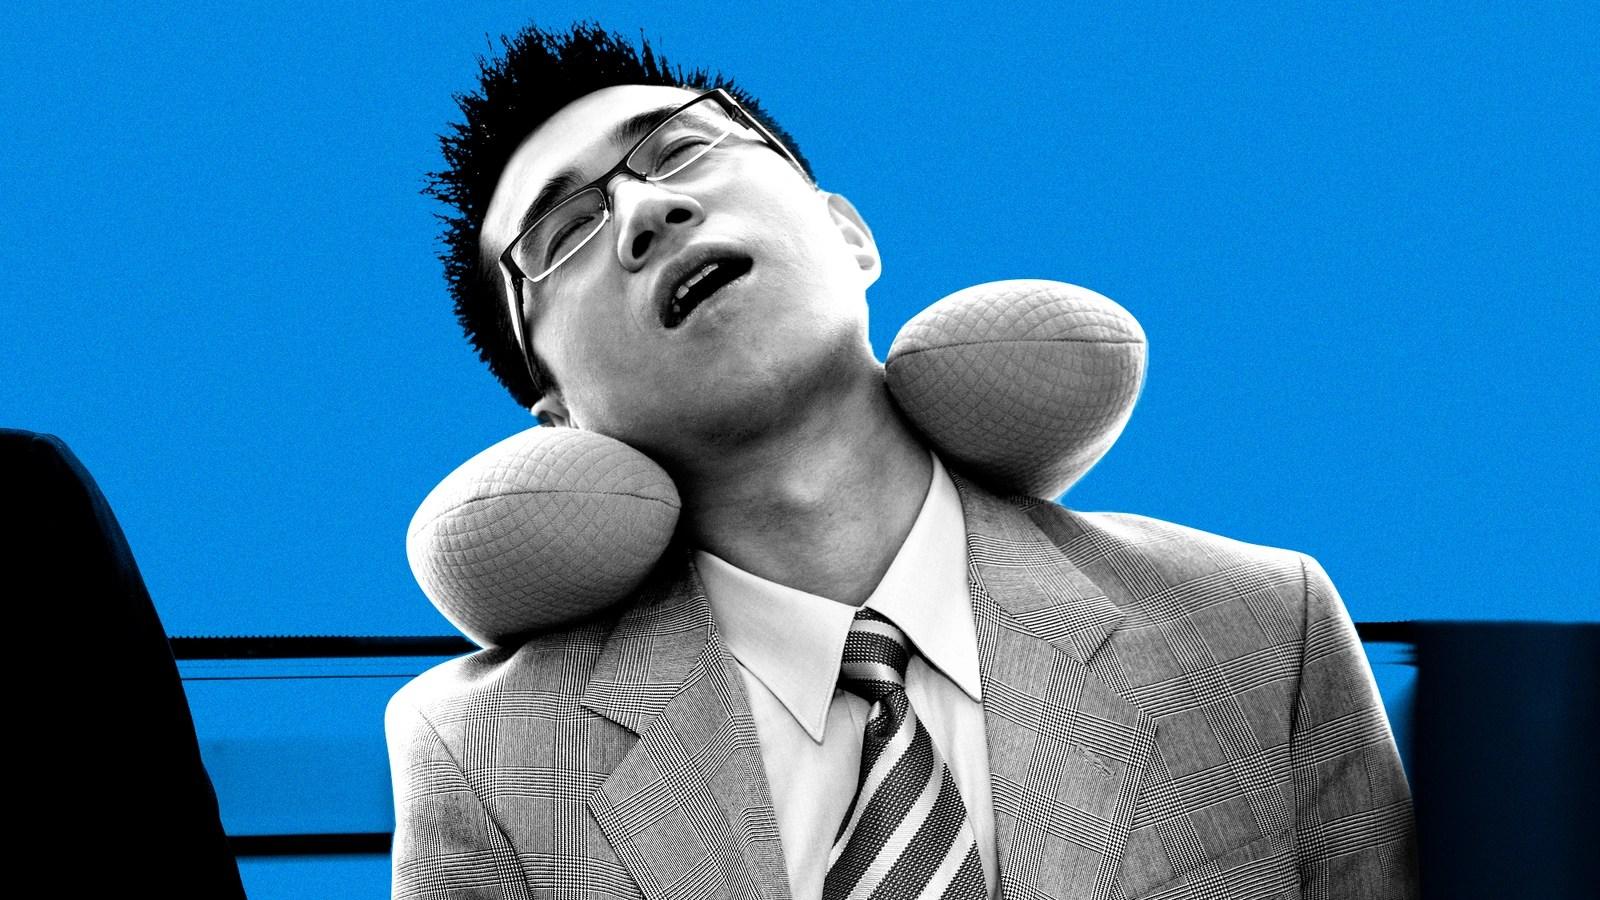 u shaped travel neck pillow is useless